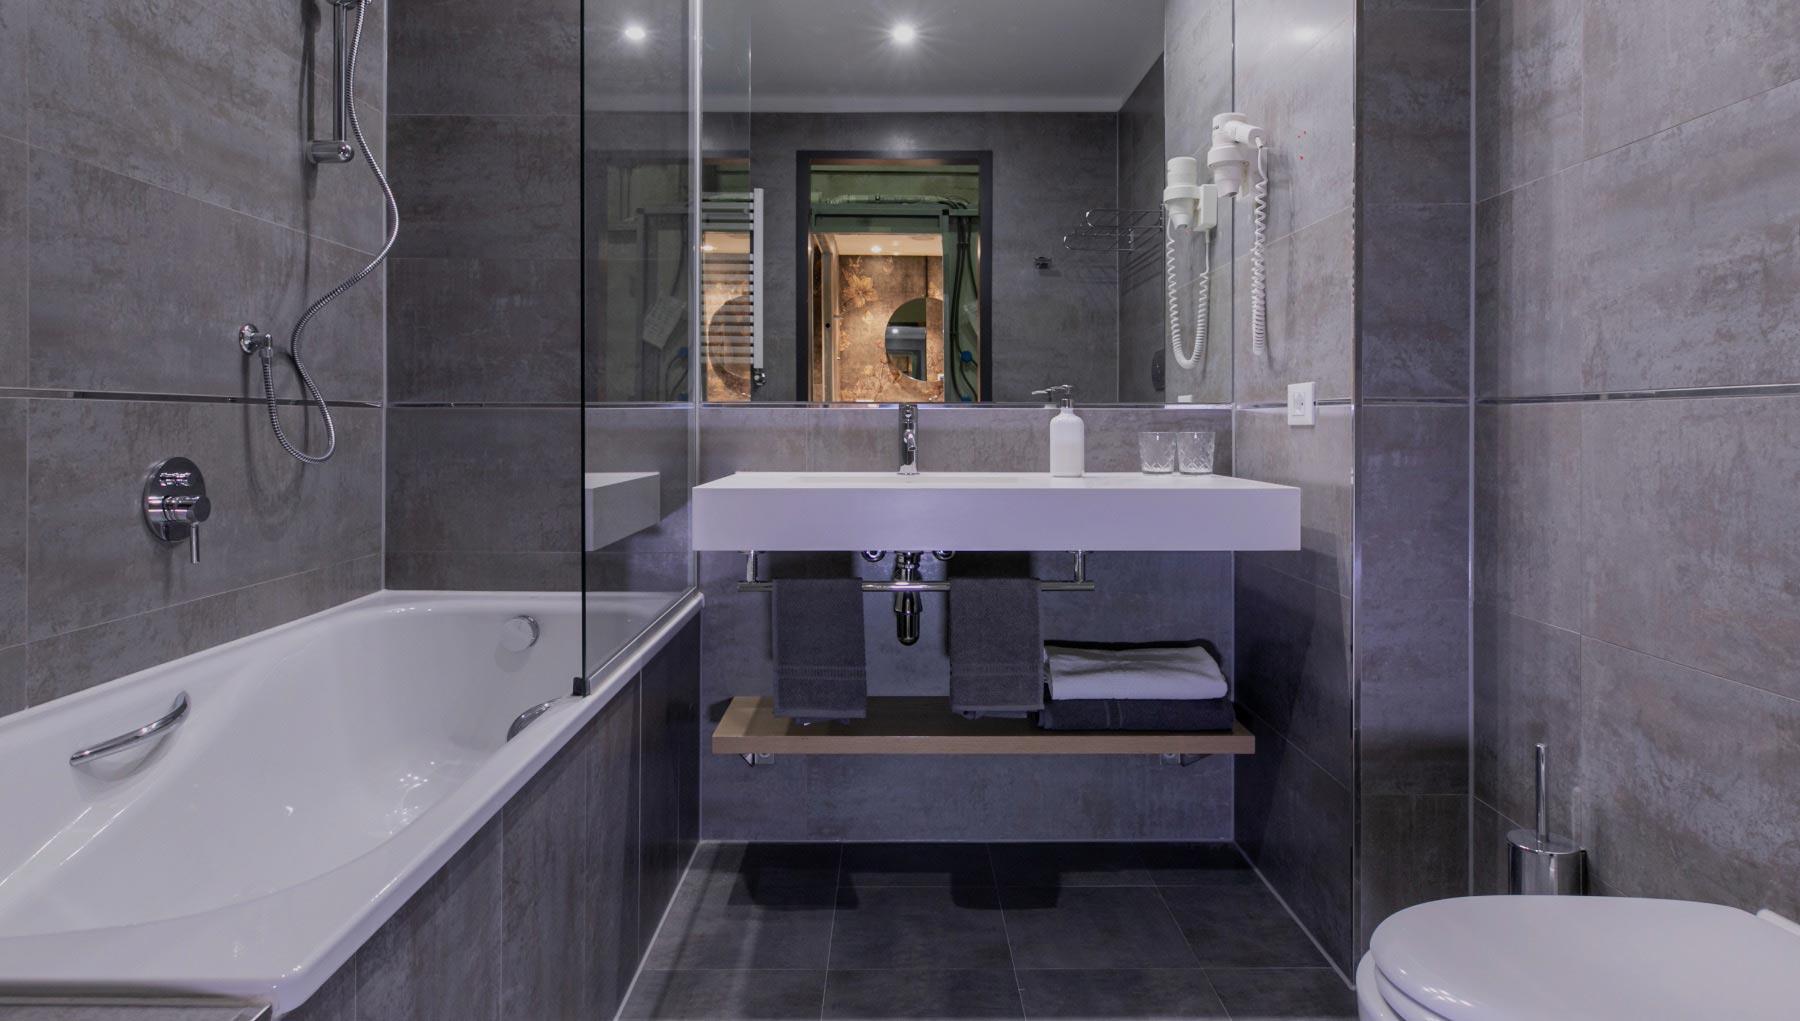 Modular bathroom design